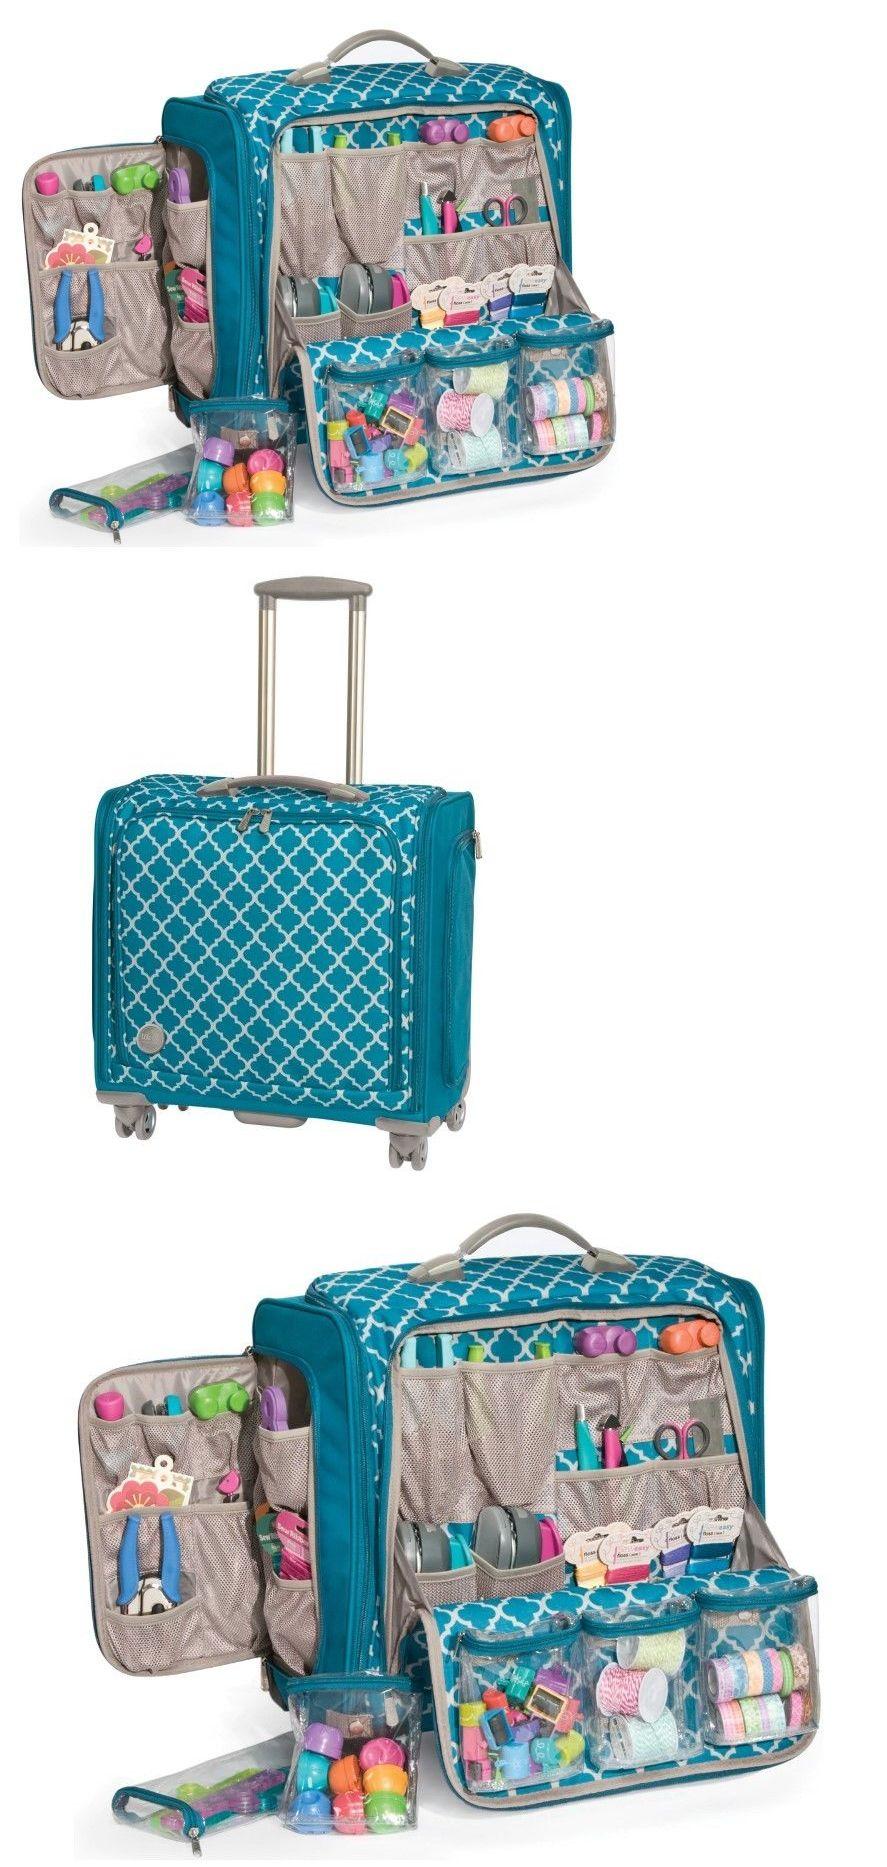 Sbooking Totes 146401 Craft Tote Bag Sewing Supplies